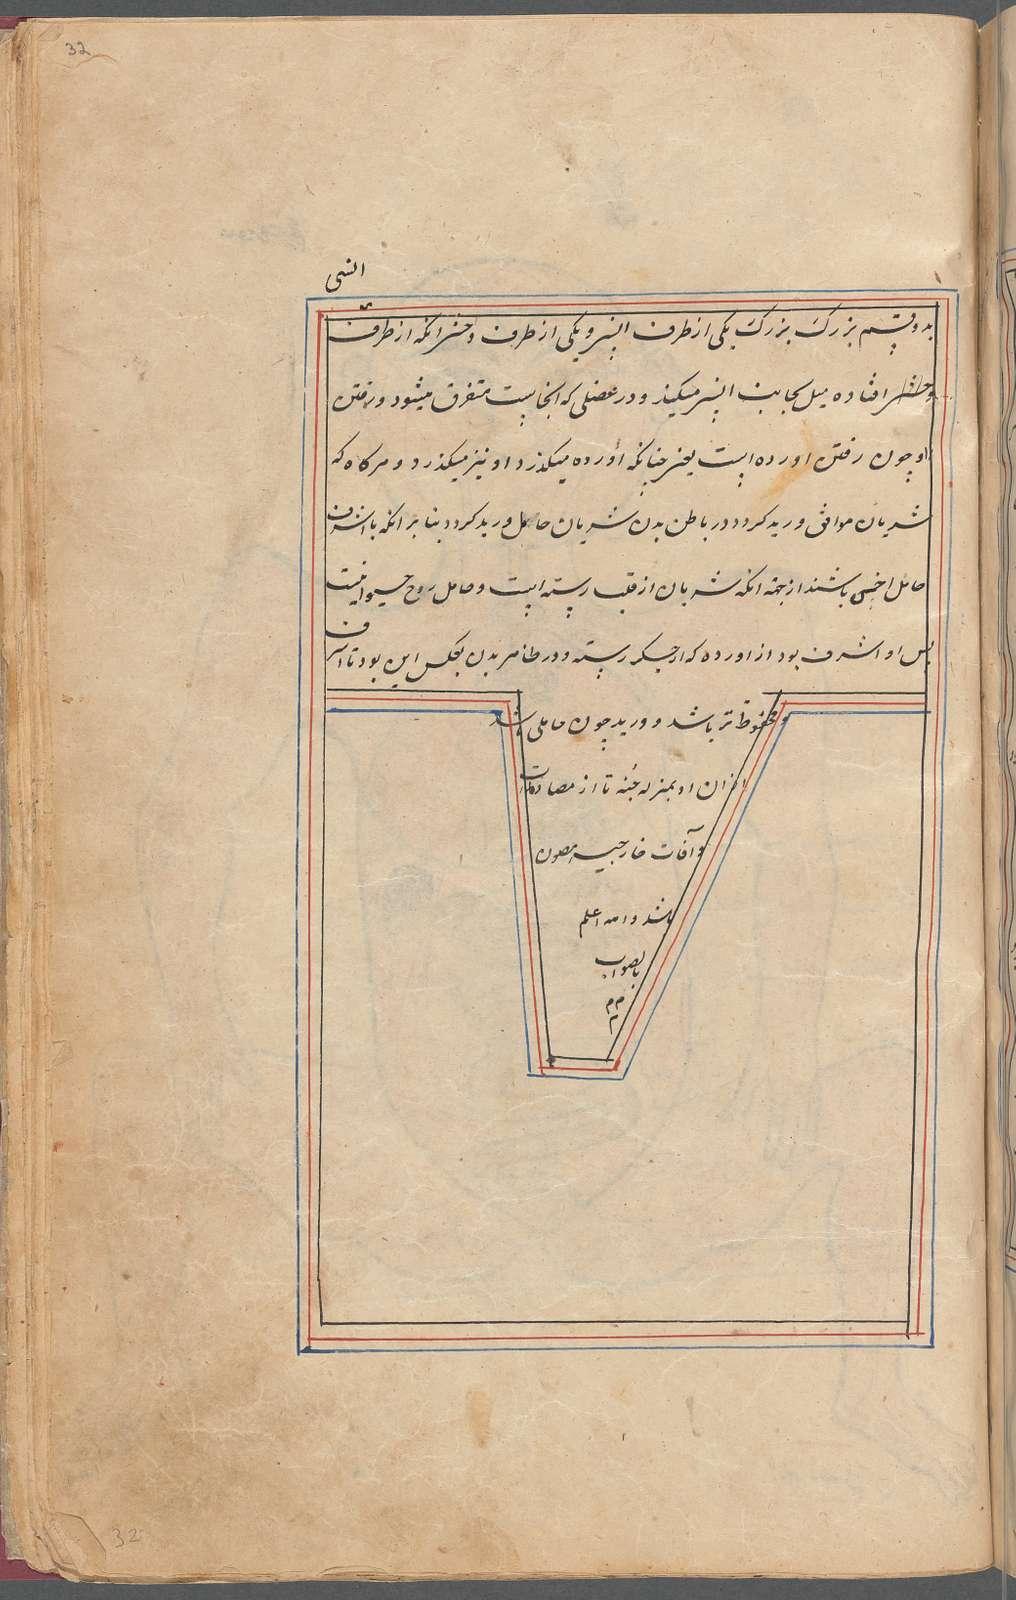 Tasrîh-i Mansûrî , fol. 32